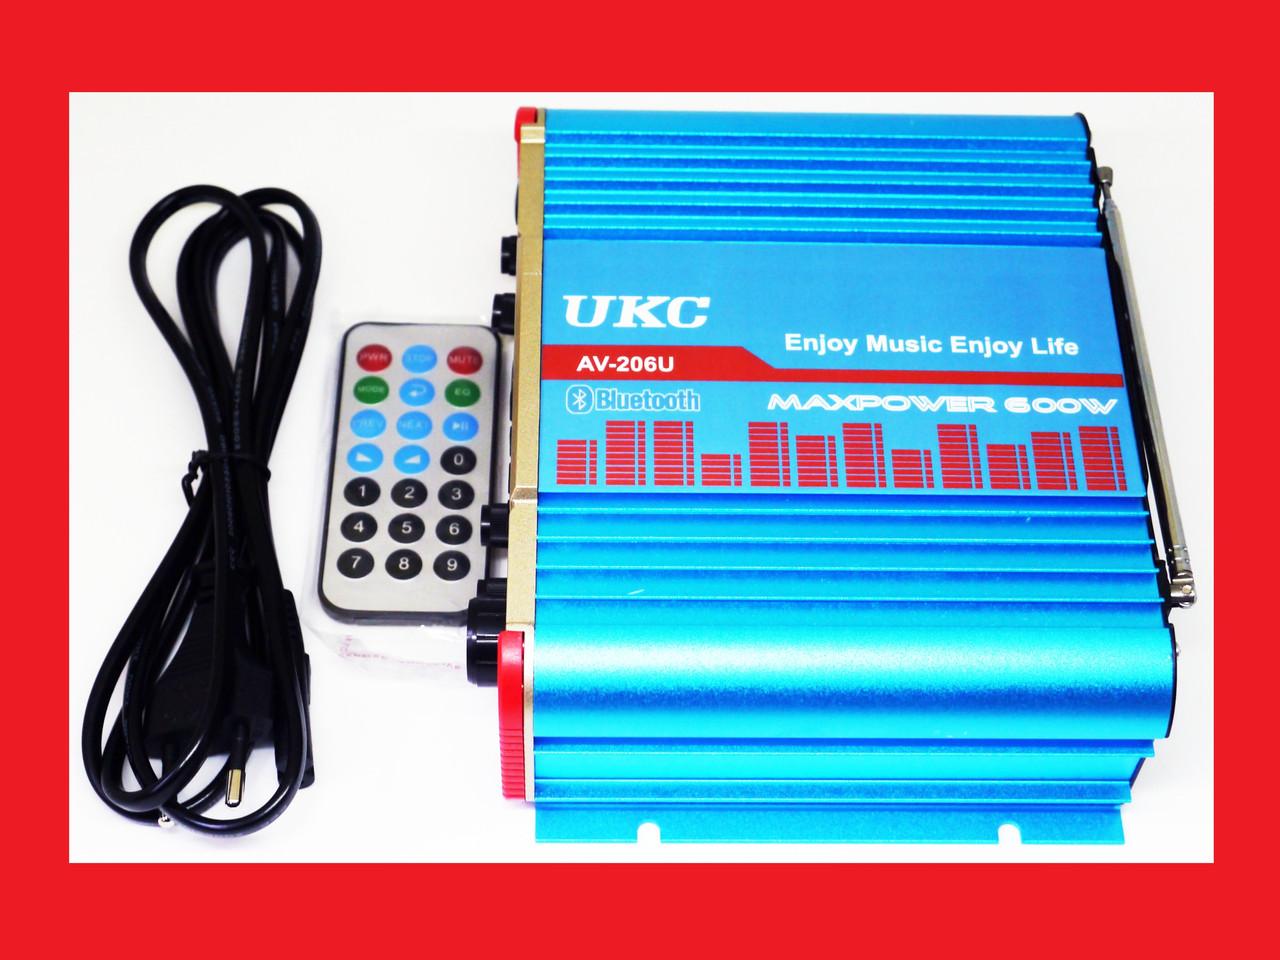 Усилитель UKC AV-206U - Bluetooth, USB,SD,FM,MP3! 300W+300W Караоке 2х канальный